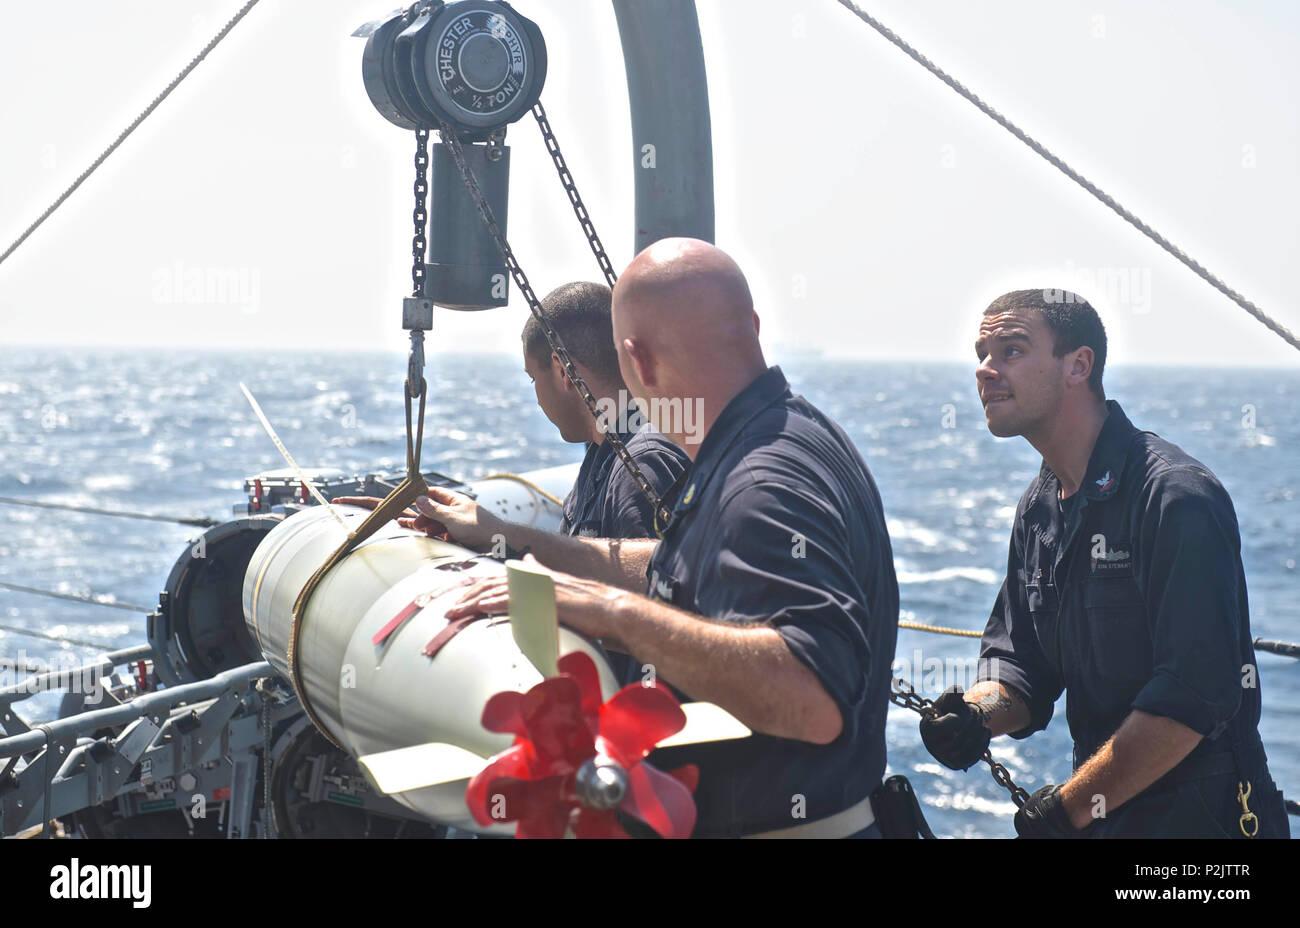 Torpedo Tubes Stock Photos & Torpedo Tubes Stock Images - Alamy